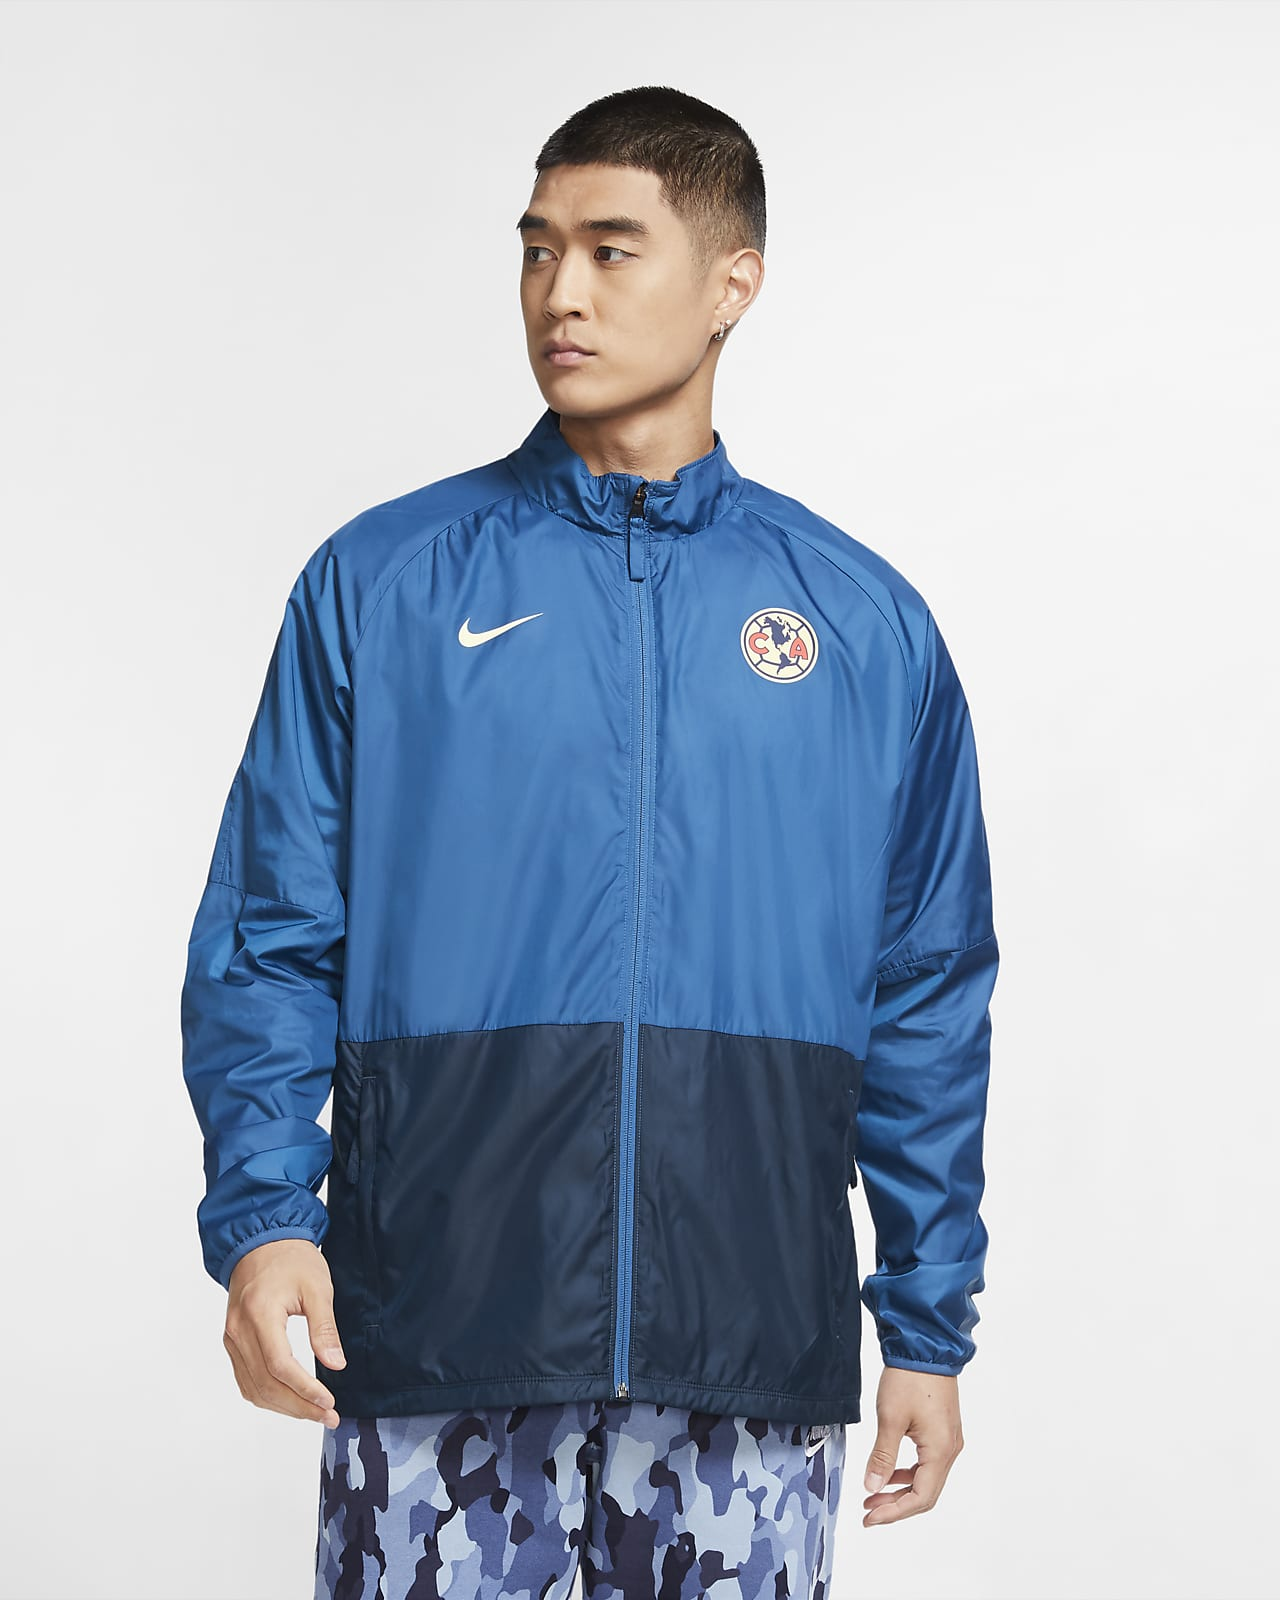 Club América Repel Academy Men's Soccer Jacket